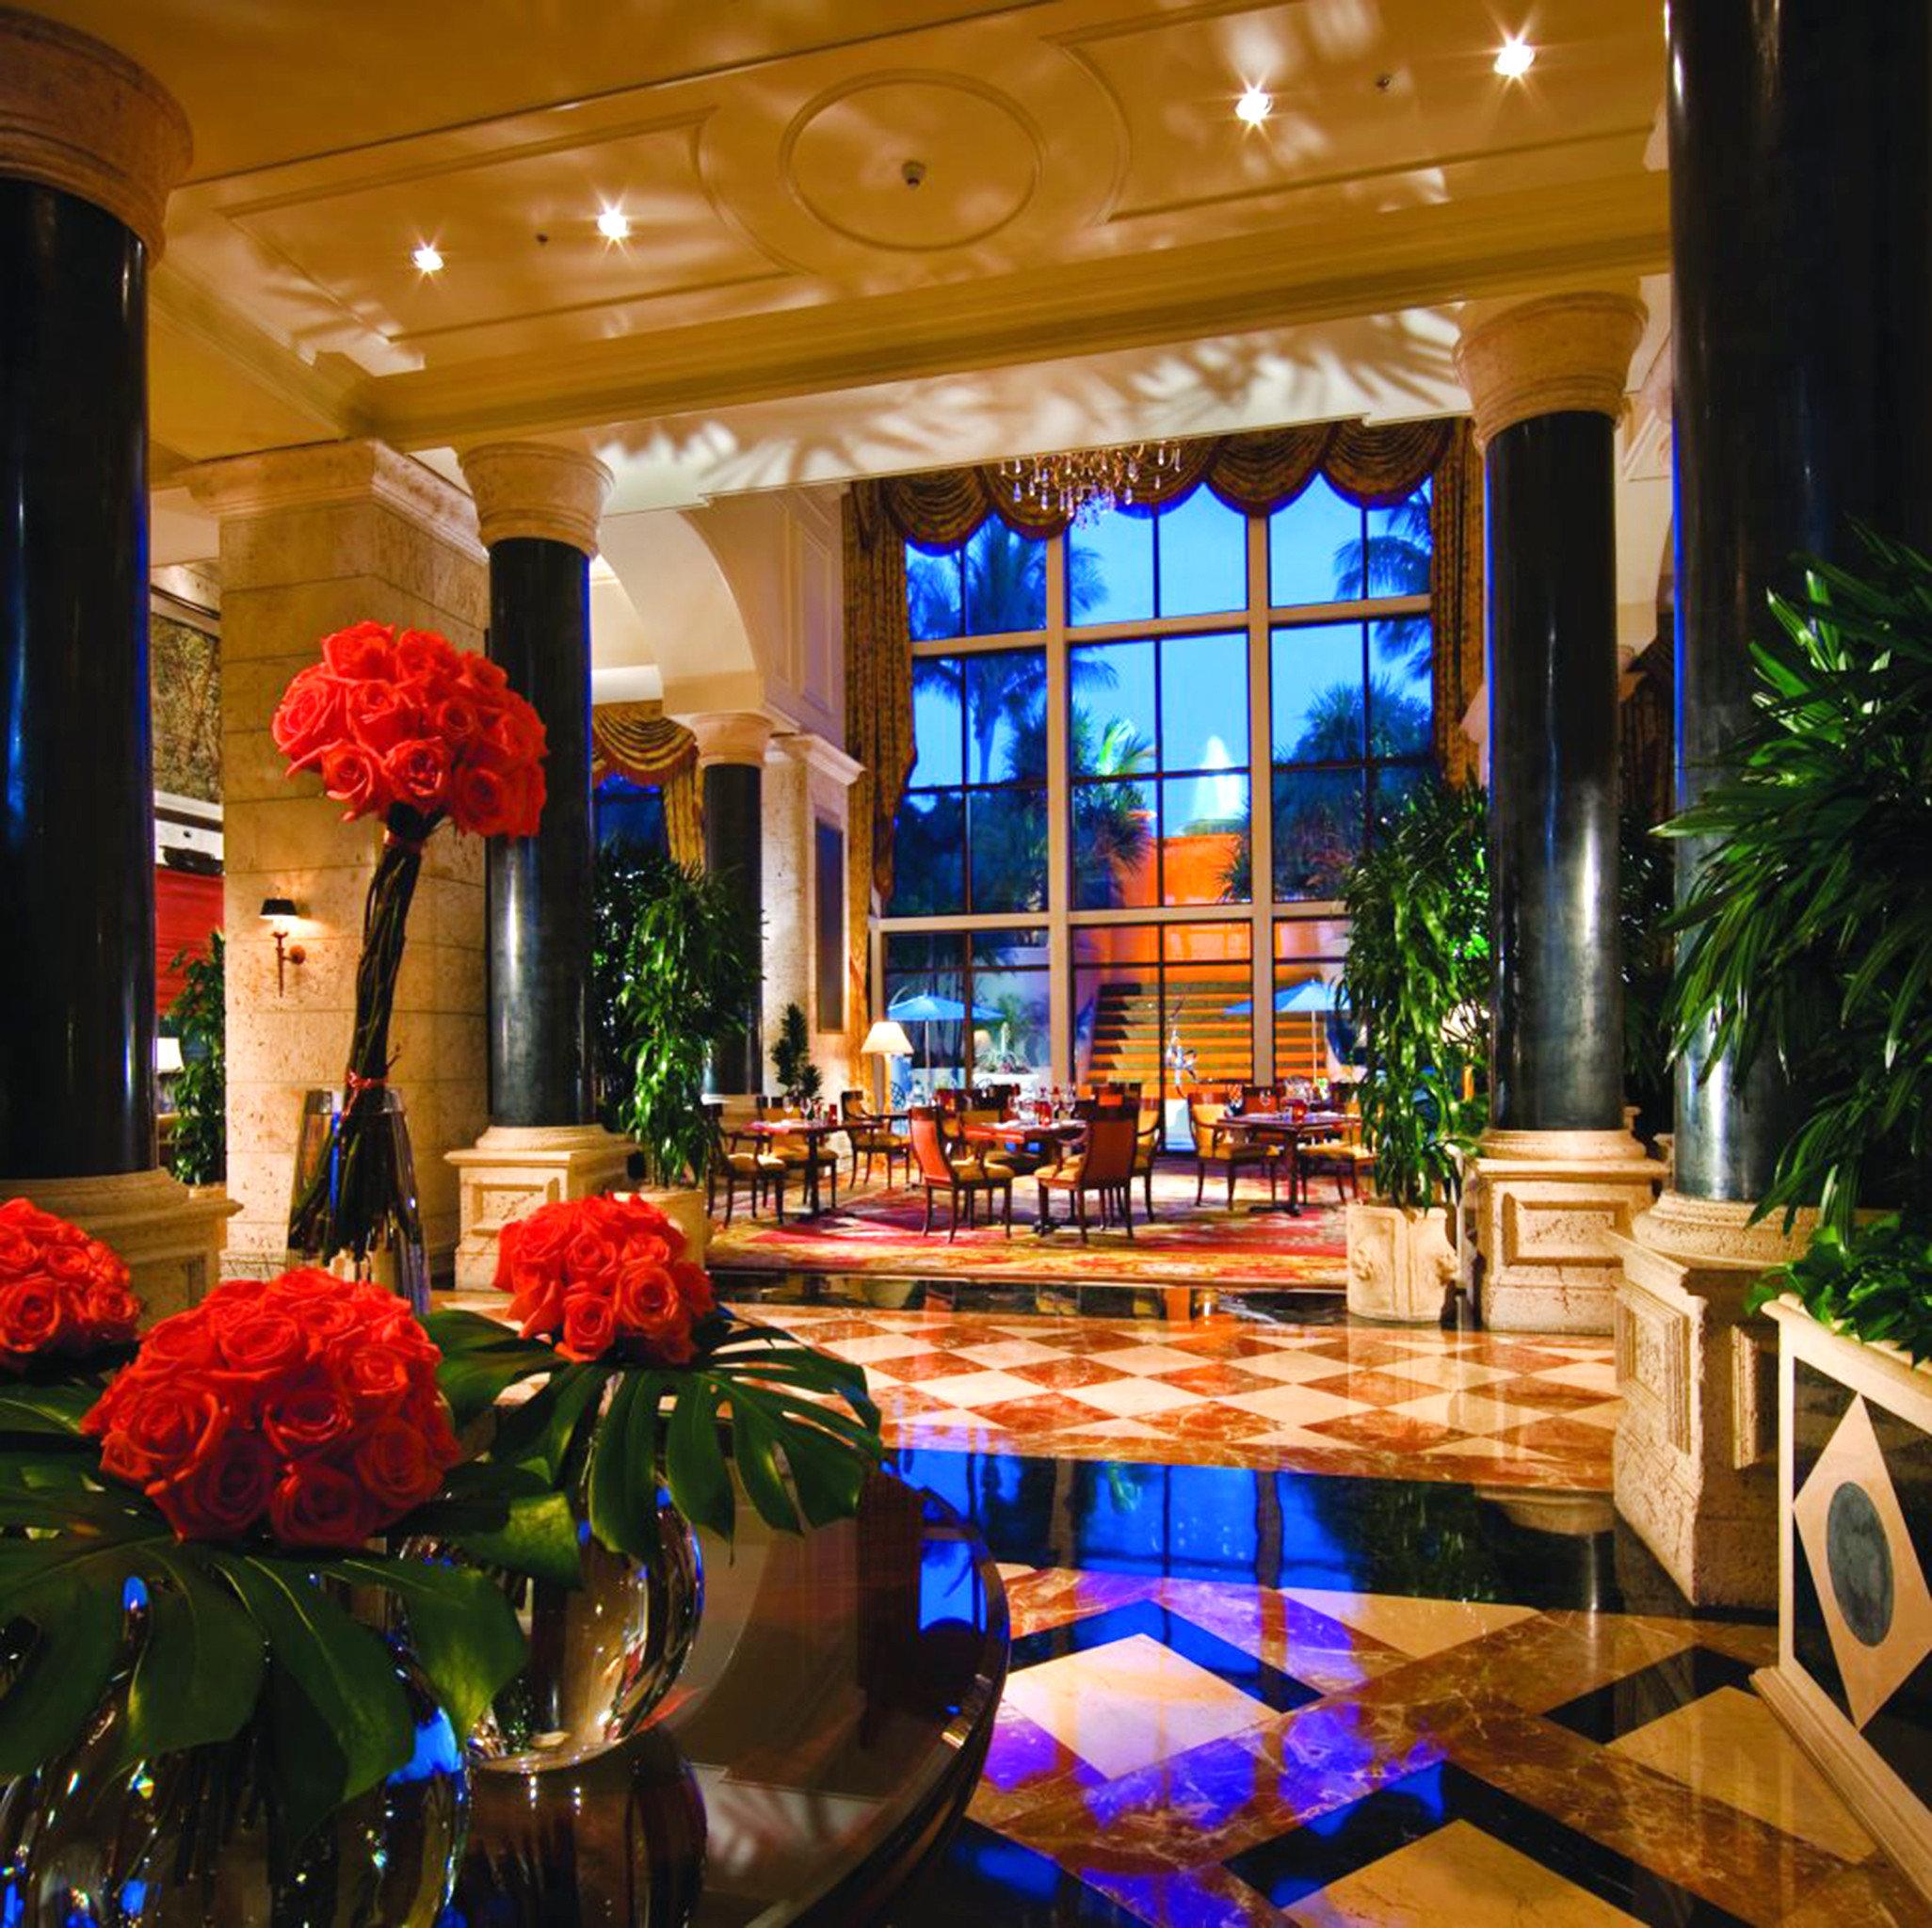 Elegant Lobby Lounge Waterfront function hall Resort ballroom restaurant flower